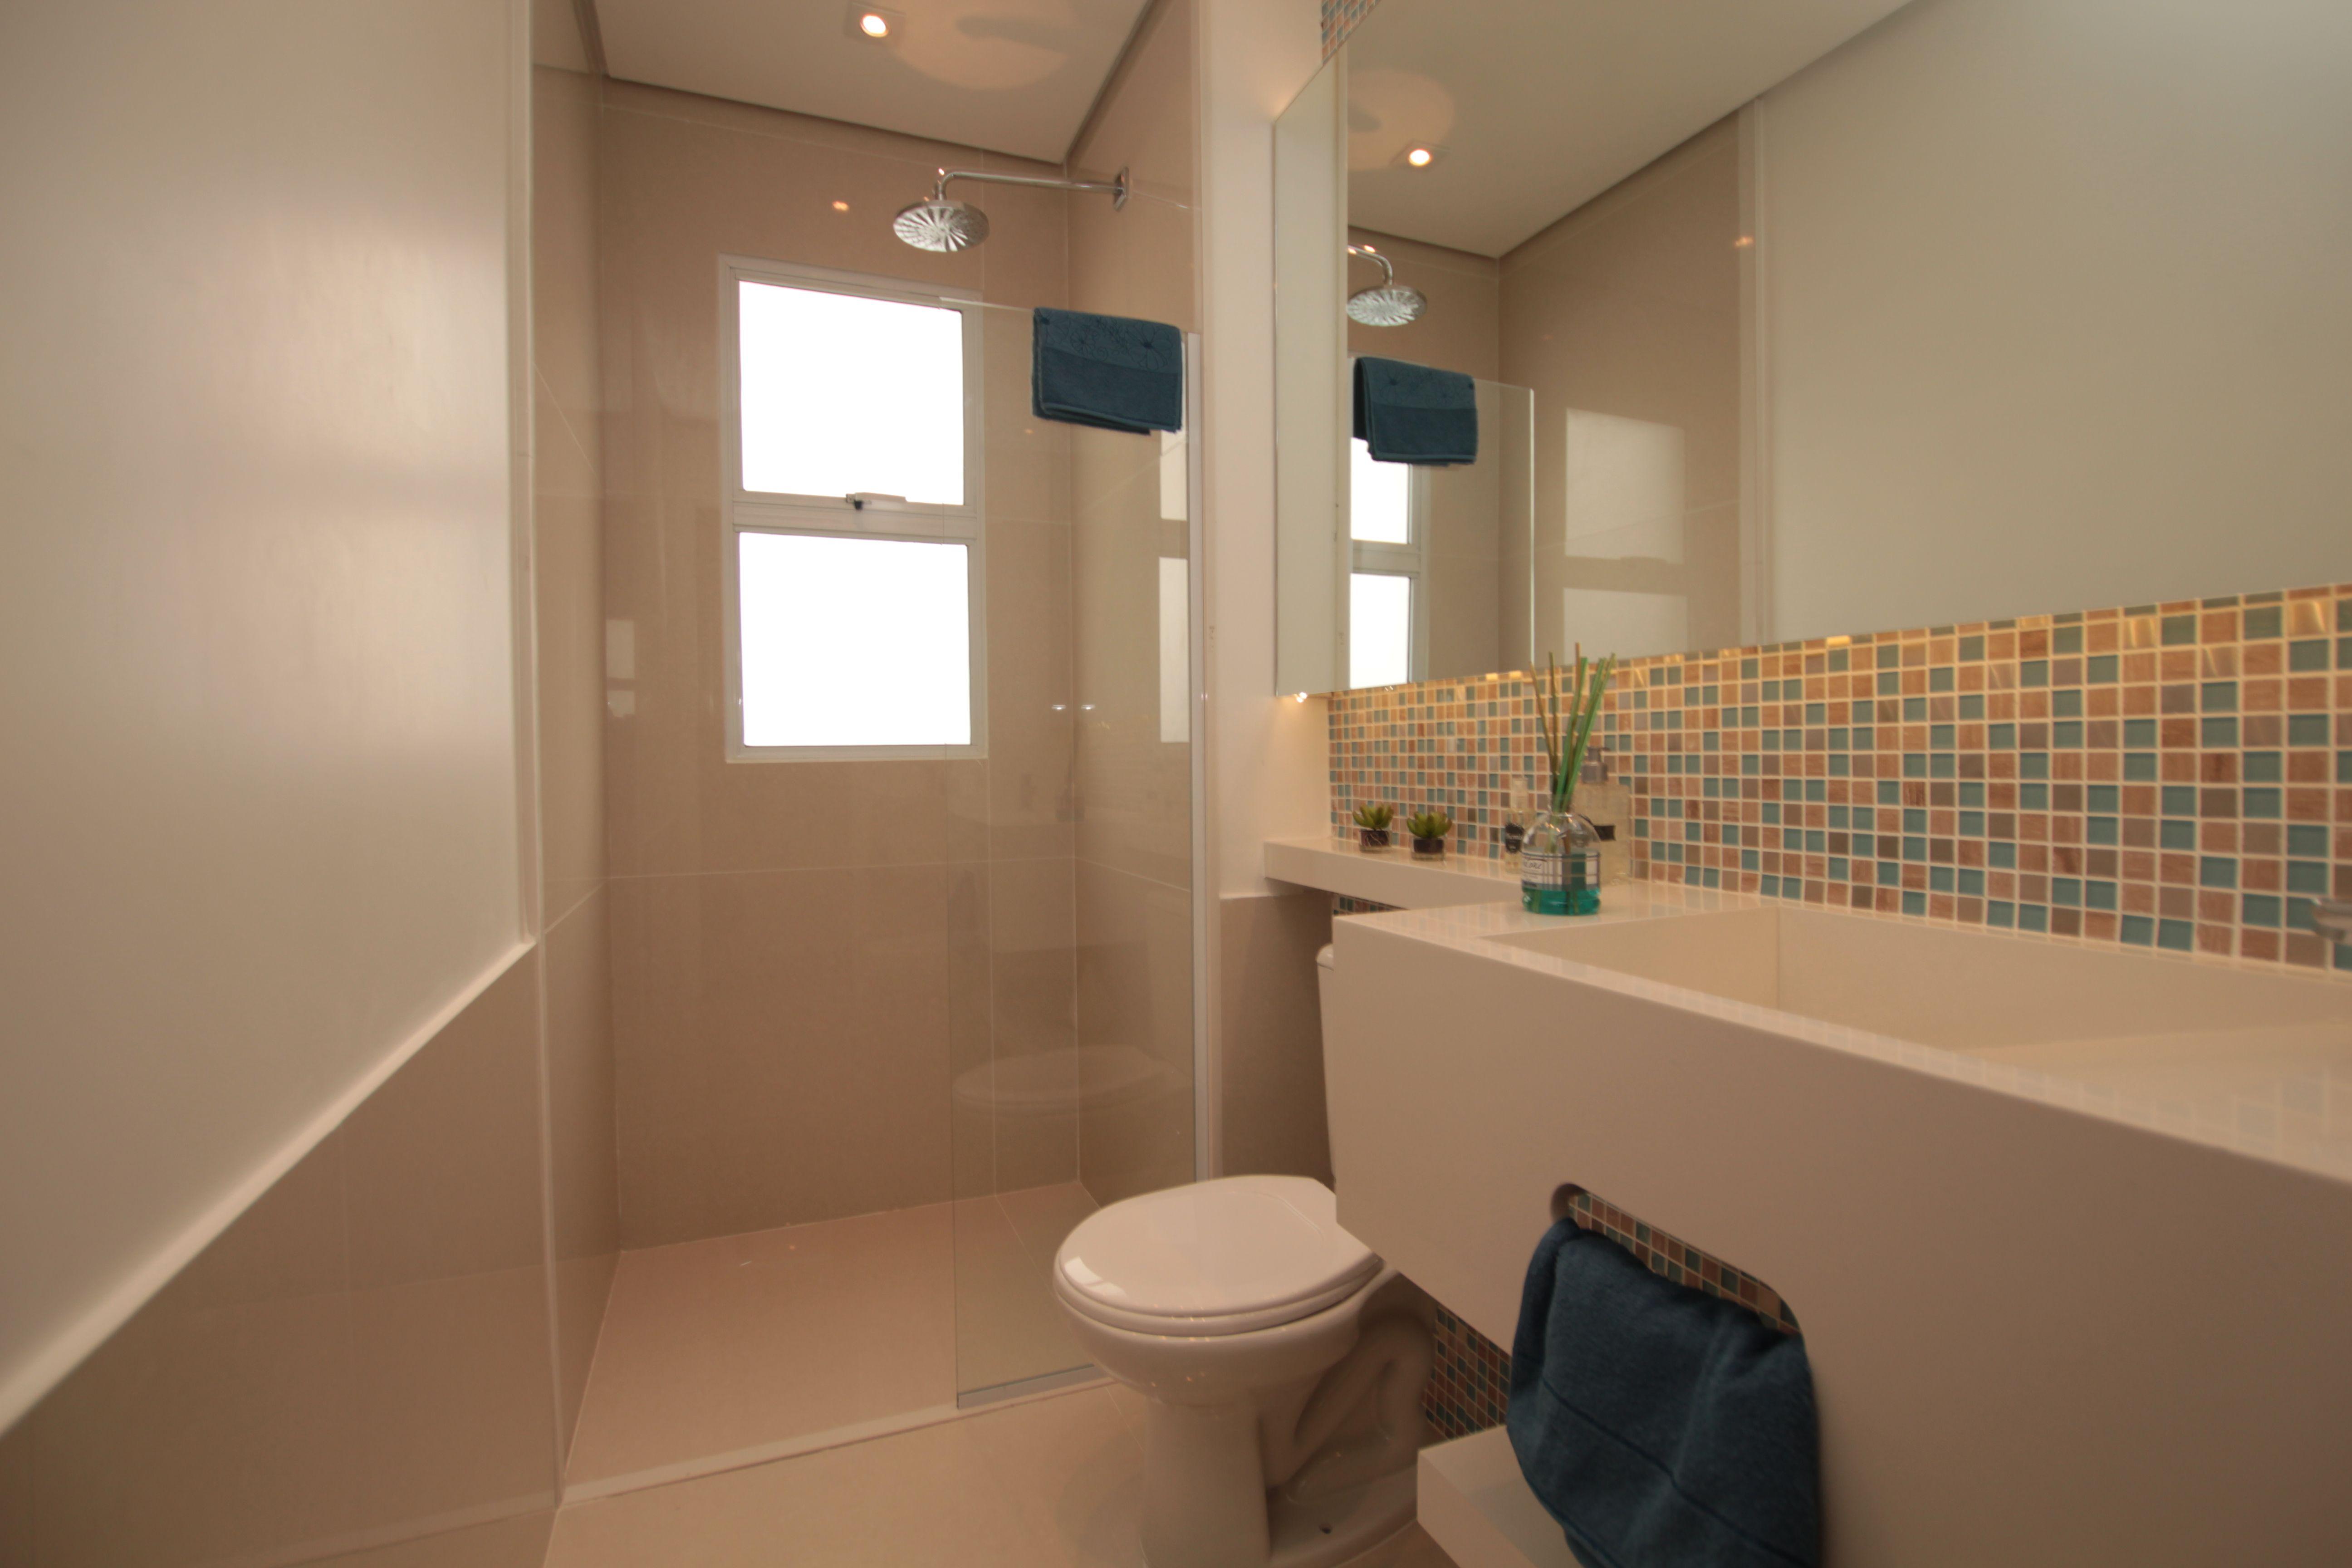 Pin by Vegus Construtora e Incorporadora on Forever Residence Resort  #8F643C 5184x3456 Bancada Banheiro Saia